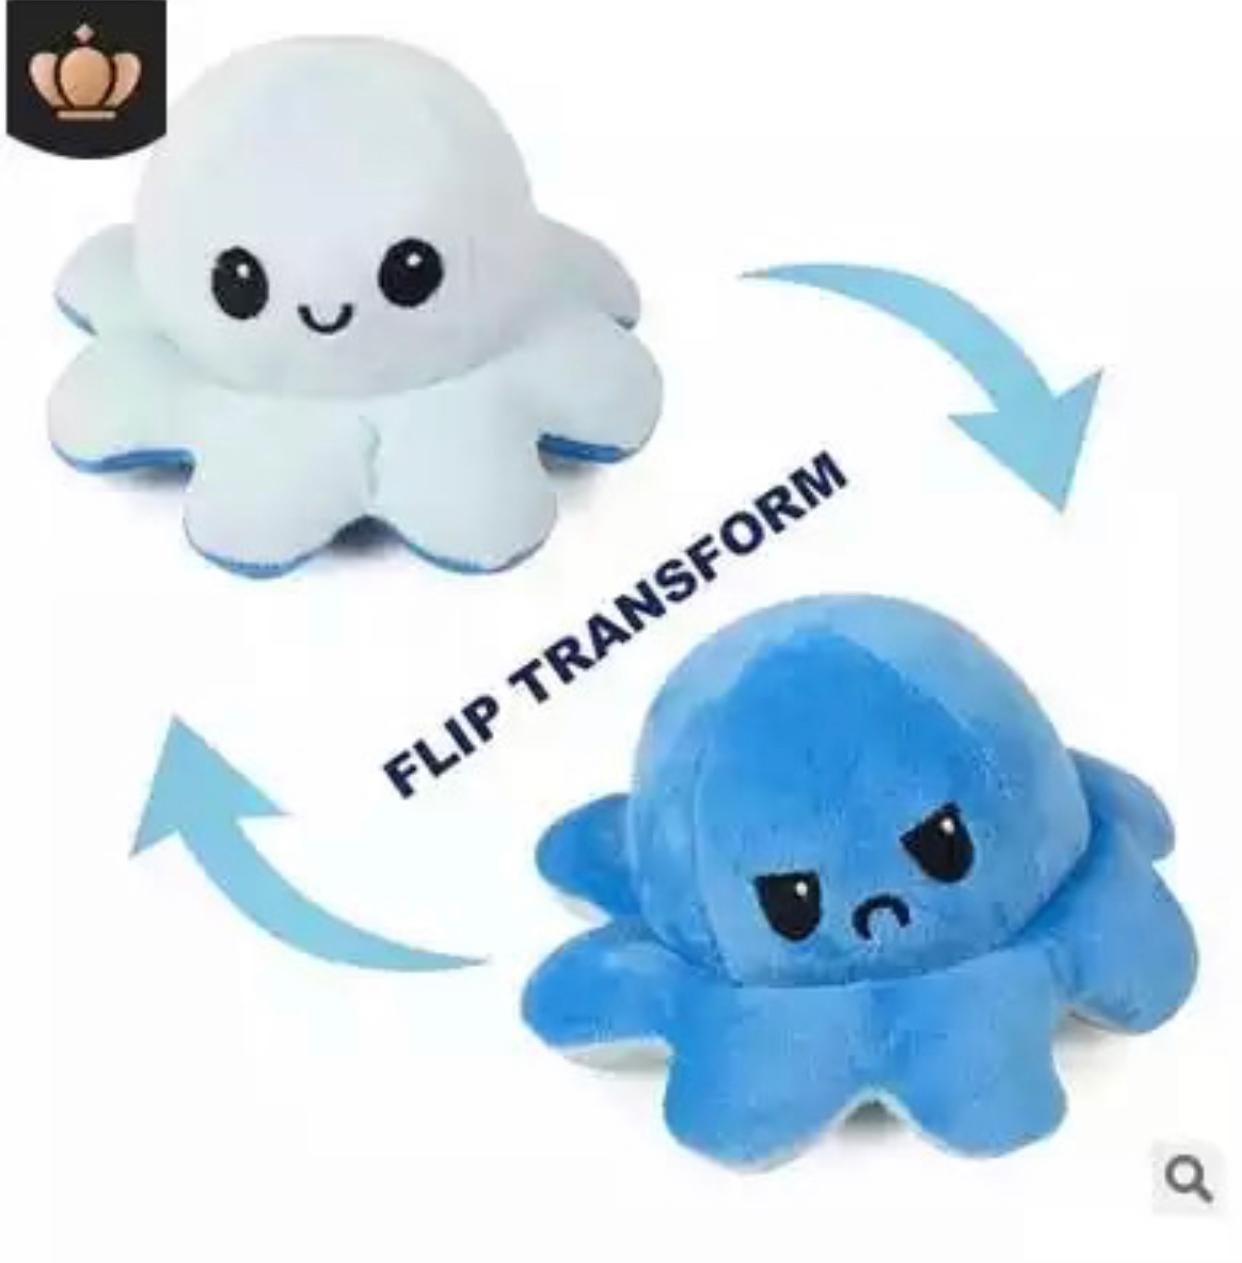 Pelucia Do Humor Polvo Flip Reversivel Branco e Azul: Kawaii Brinquedo TikTok 20cm - EV